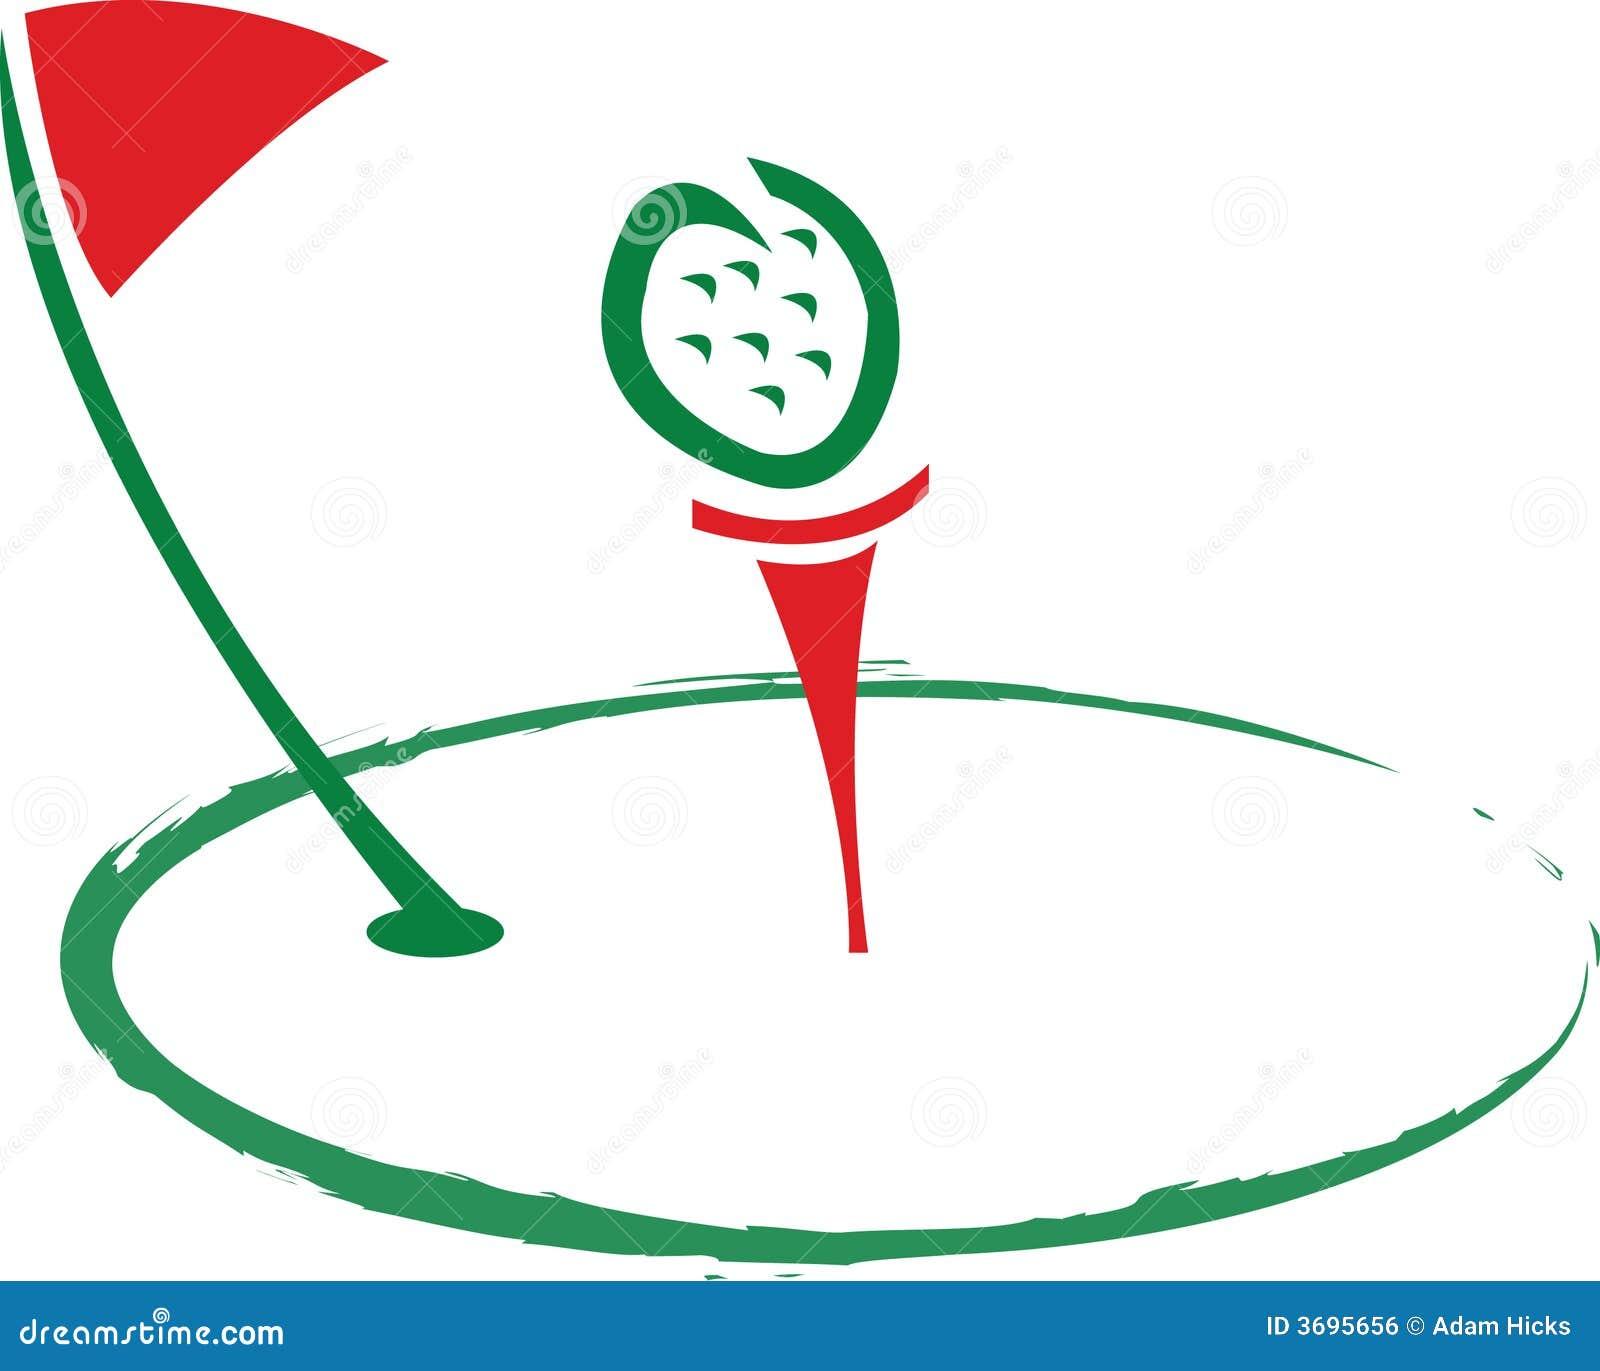 Mini Golf Business Plan